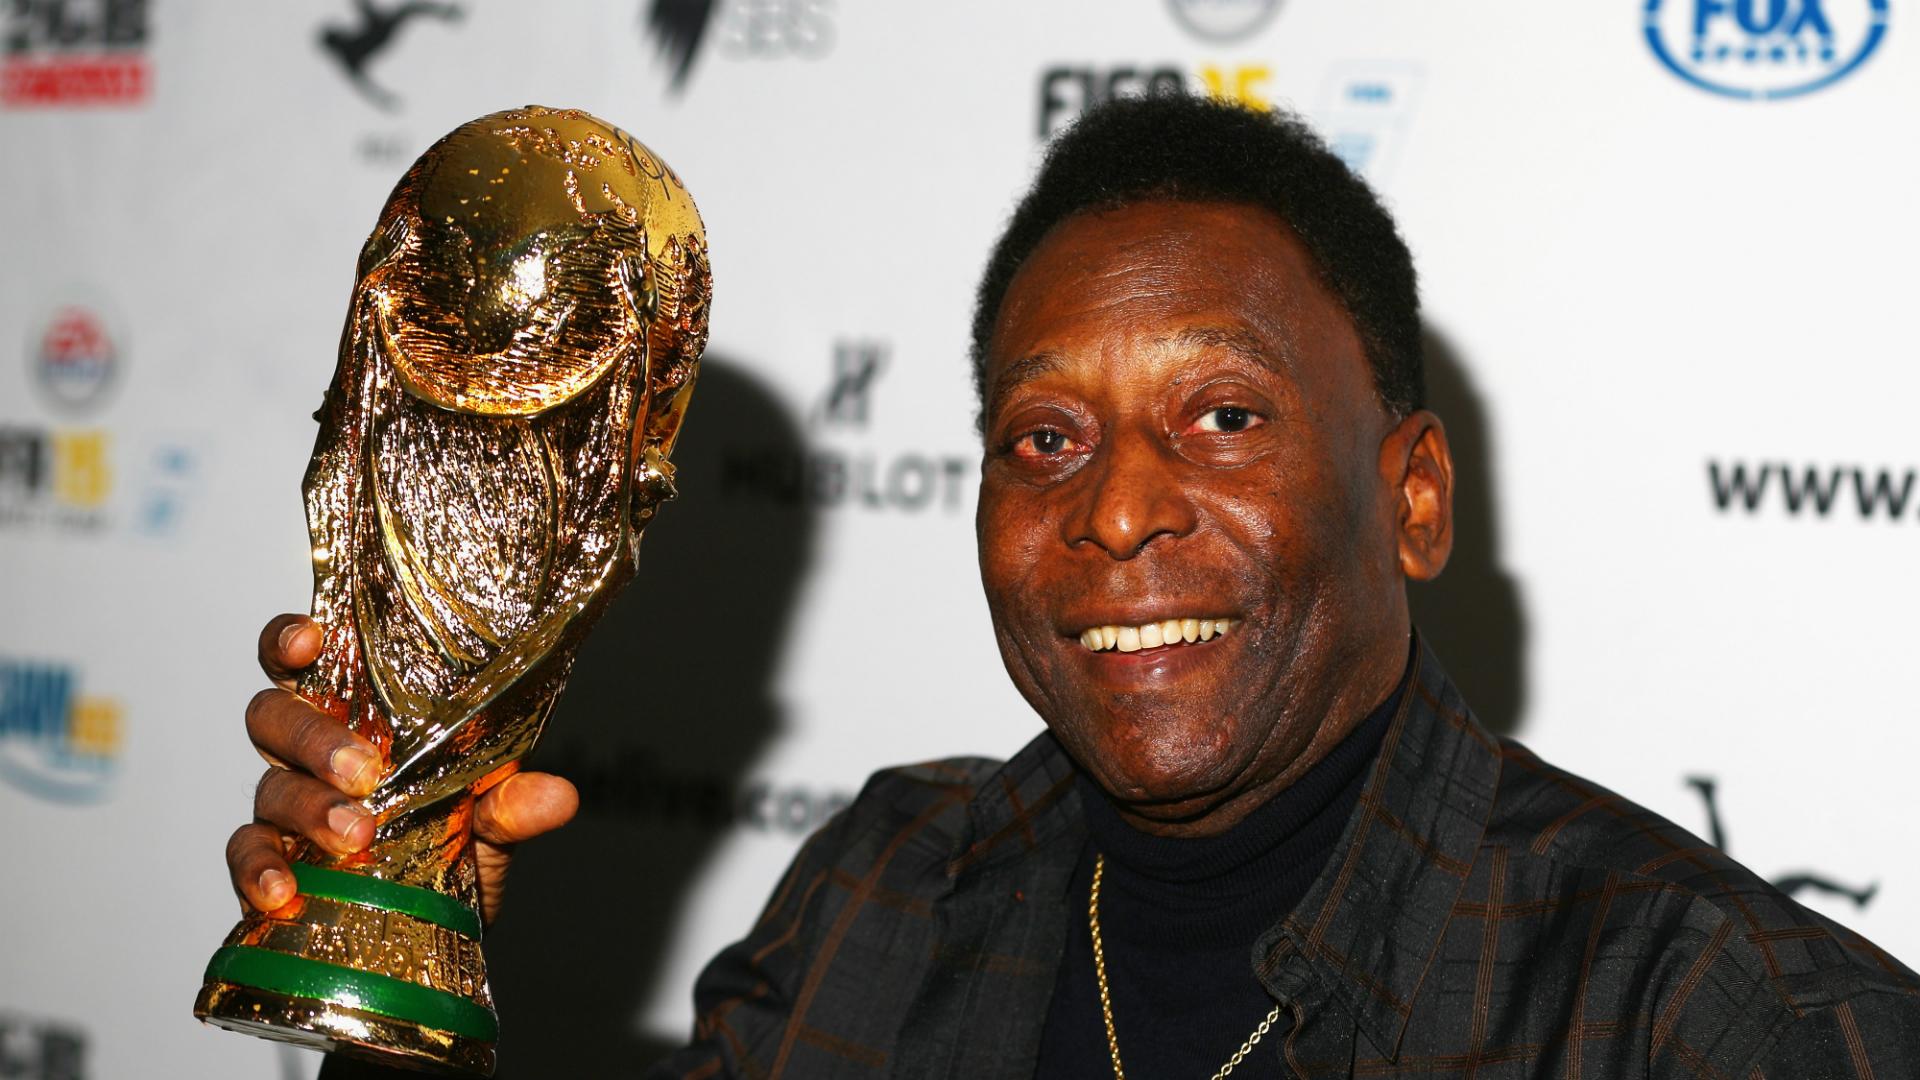 Pele back in Brazil after hospital stay in Paris